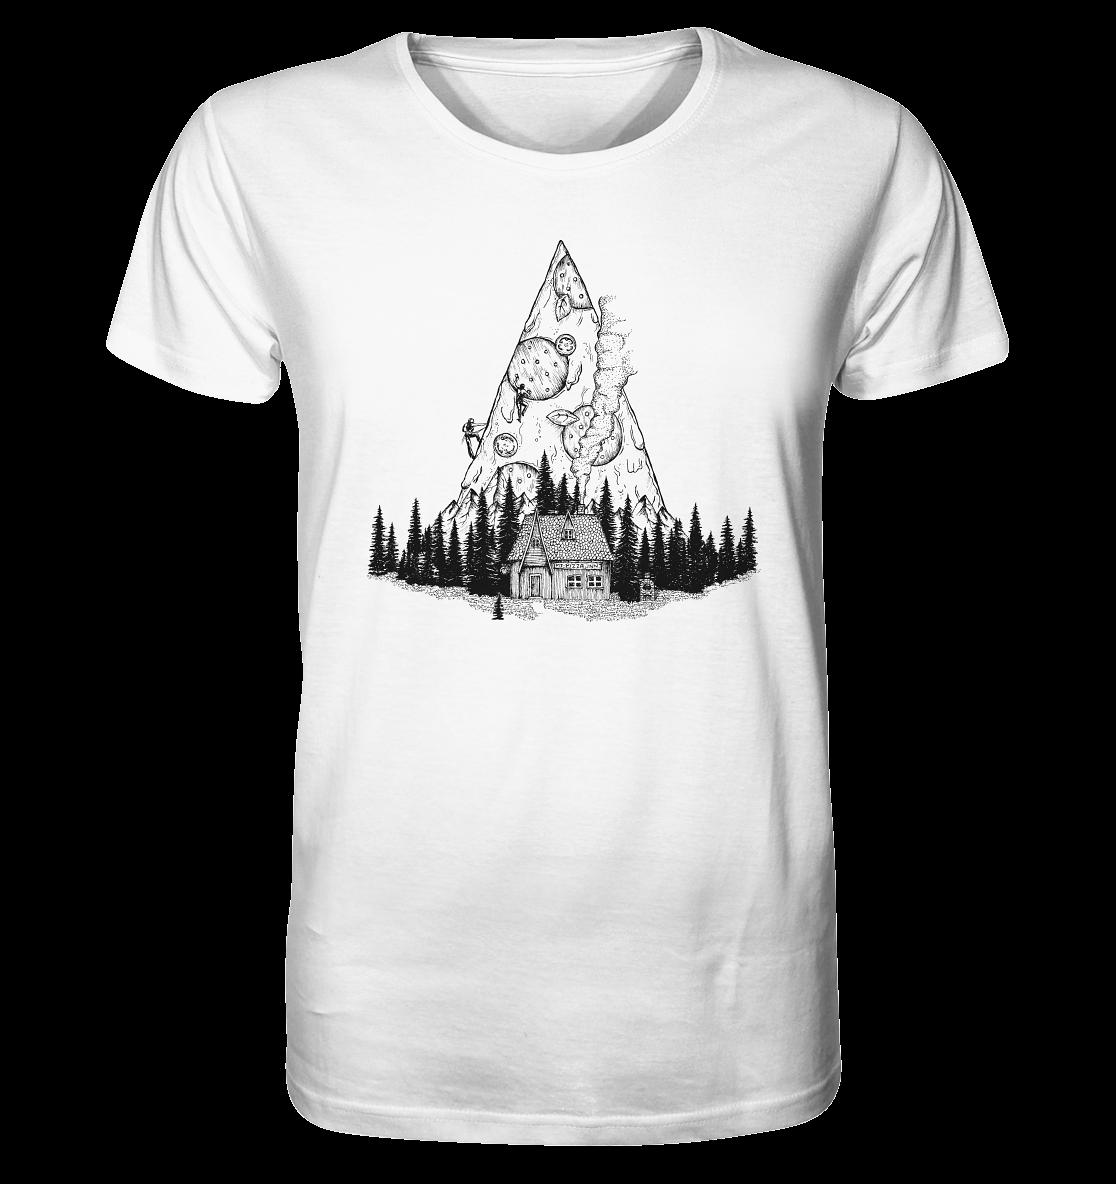 front-organic-shirt-f8f8f8-1116x-6.png